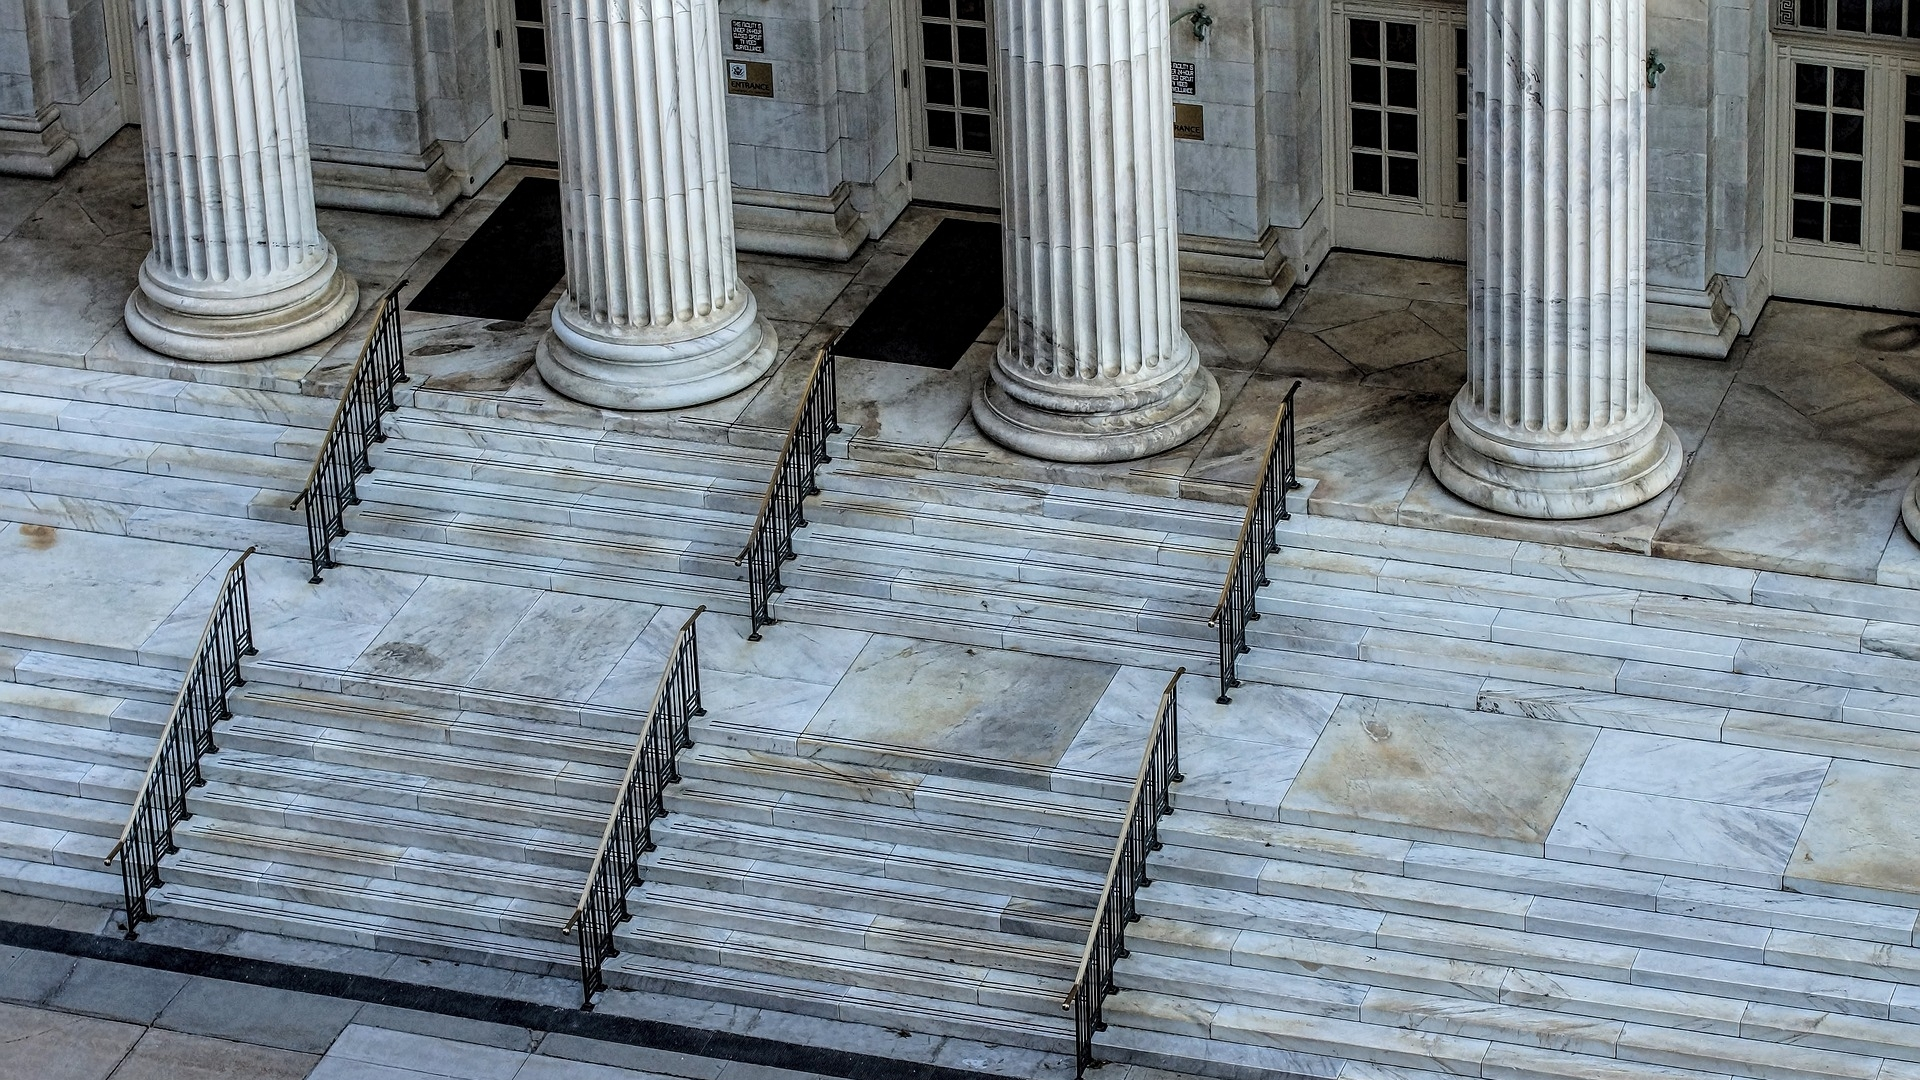 website - courthouse-1223280_1920.jpg